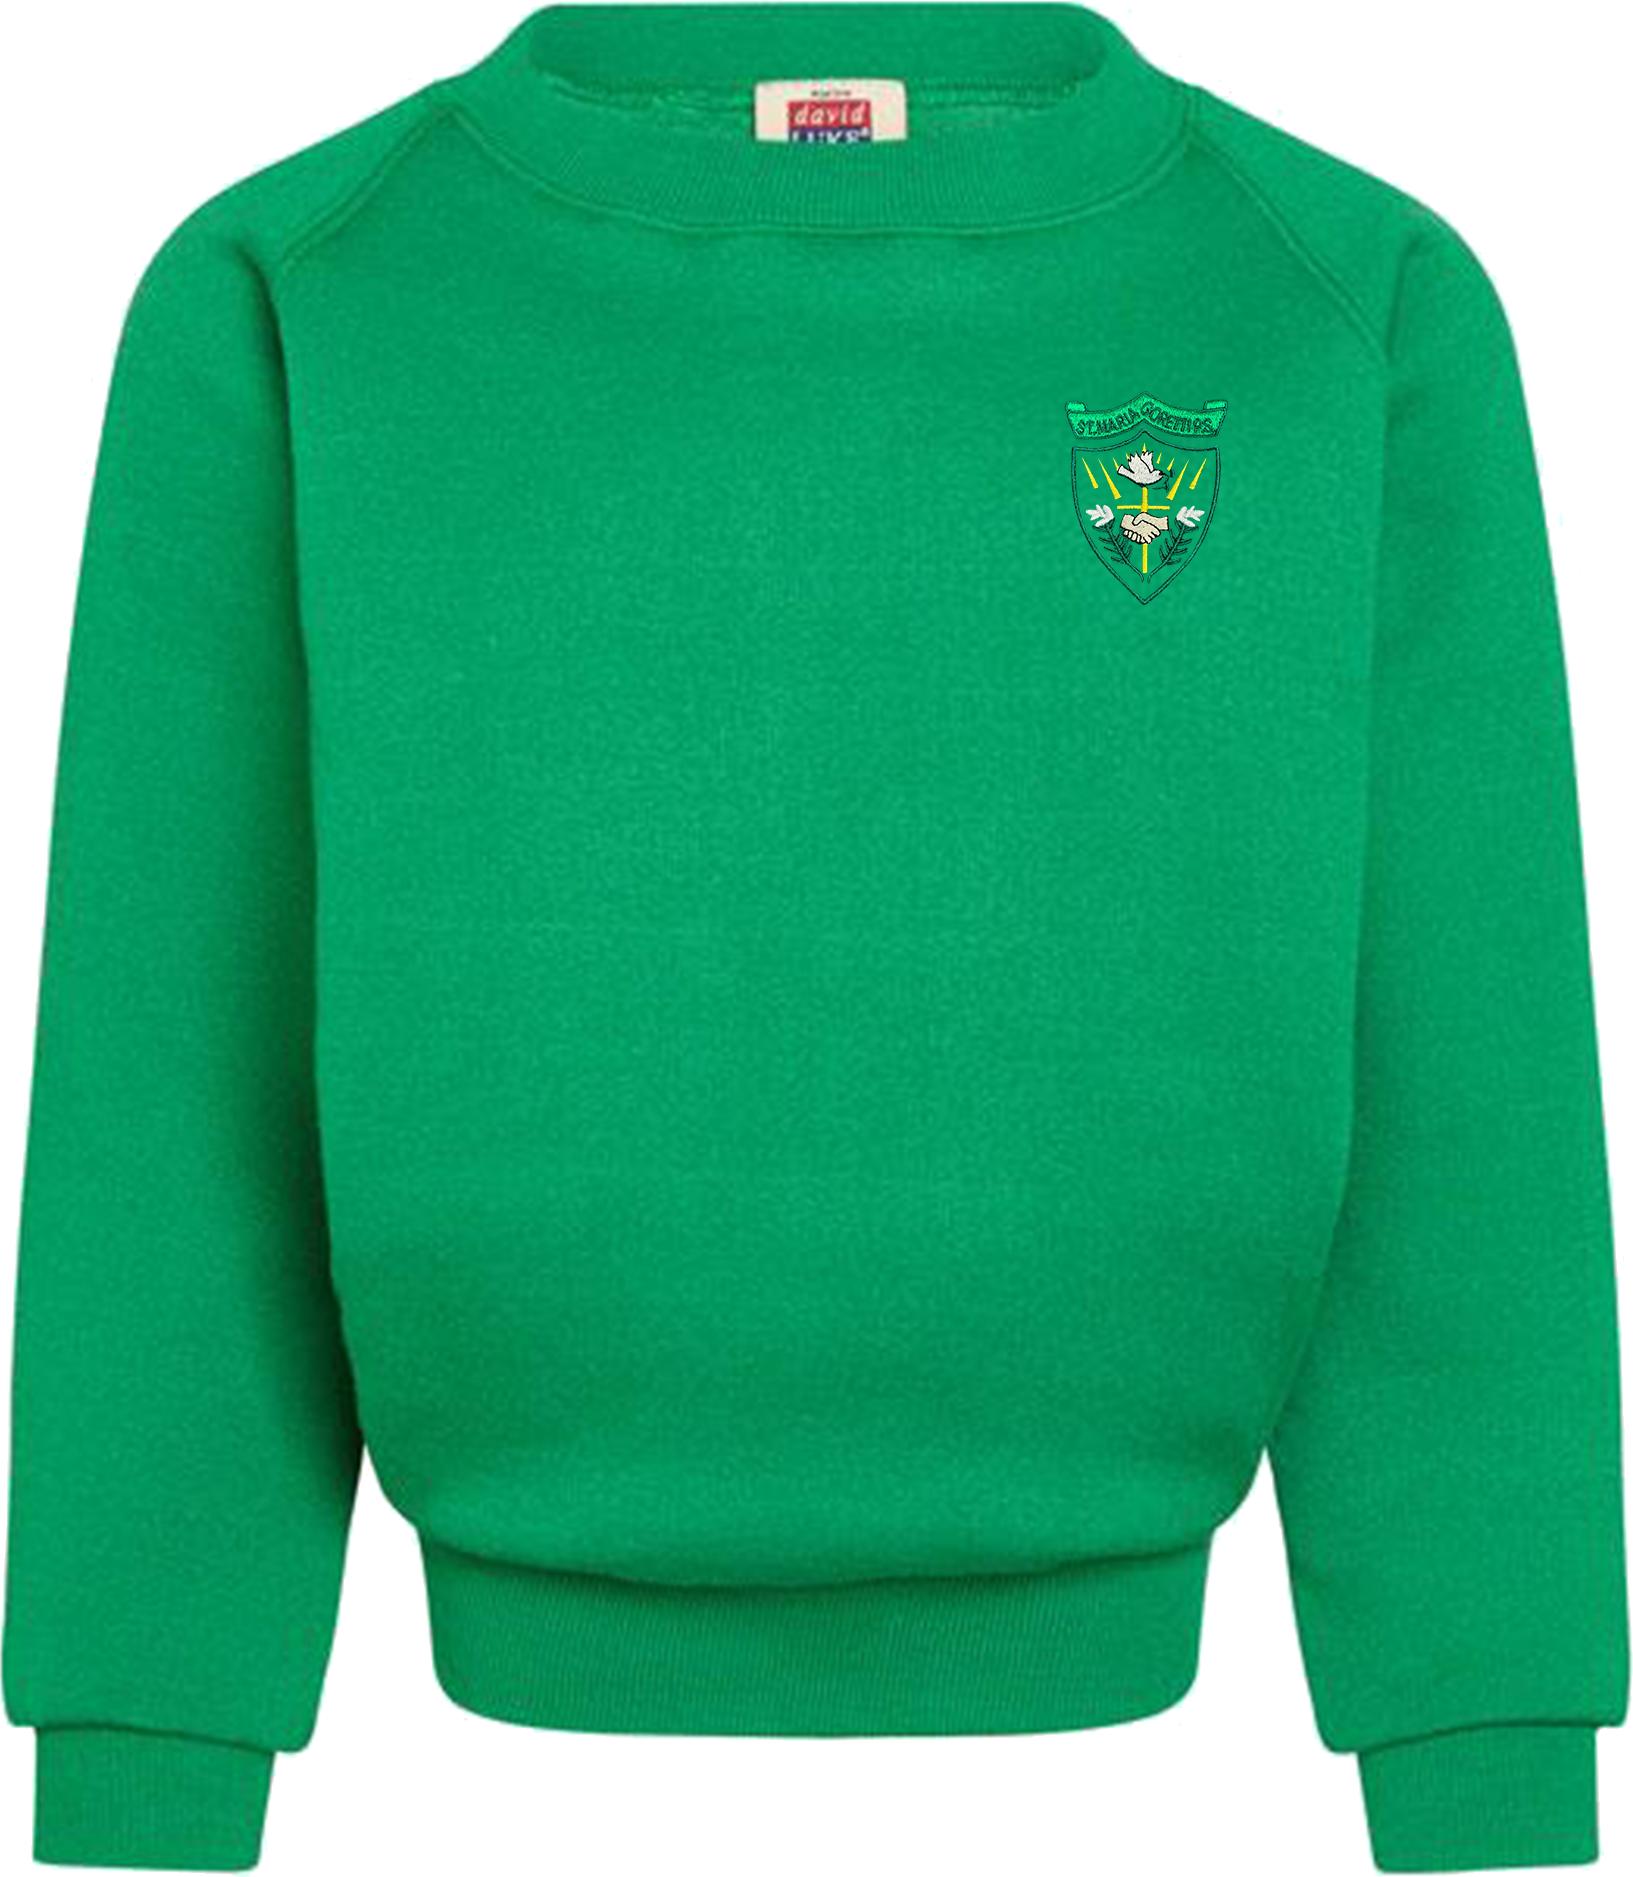 St. Maria Goretti Primary Round Neck Sweatshirt